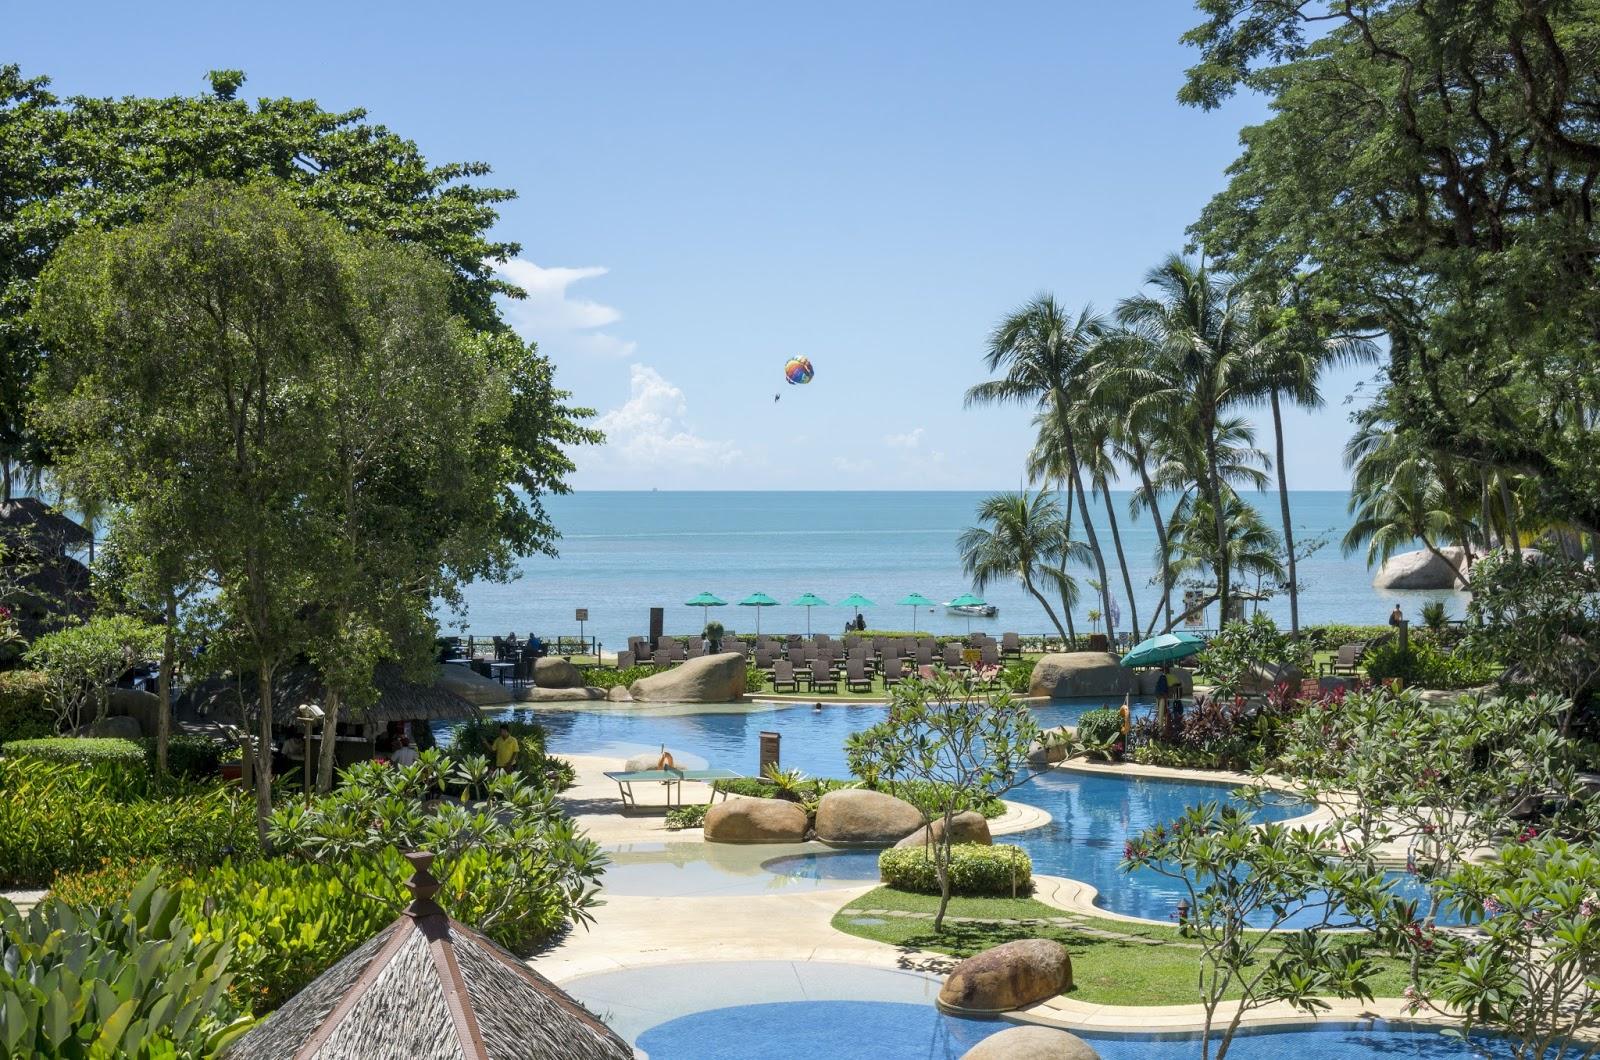 malaysia review of the shangri la 39 s rasa sayang resort. Black Bedroom Furniture Sets. Home Design Ideas